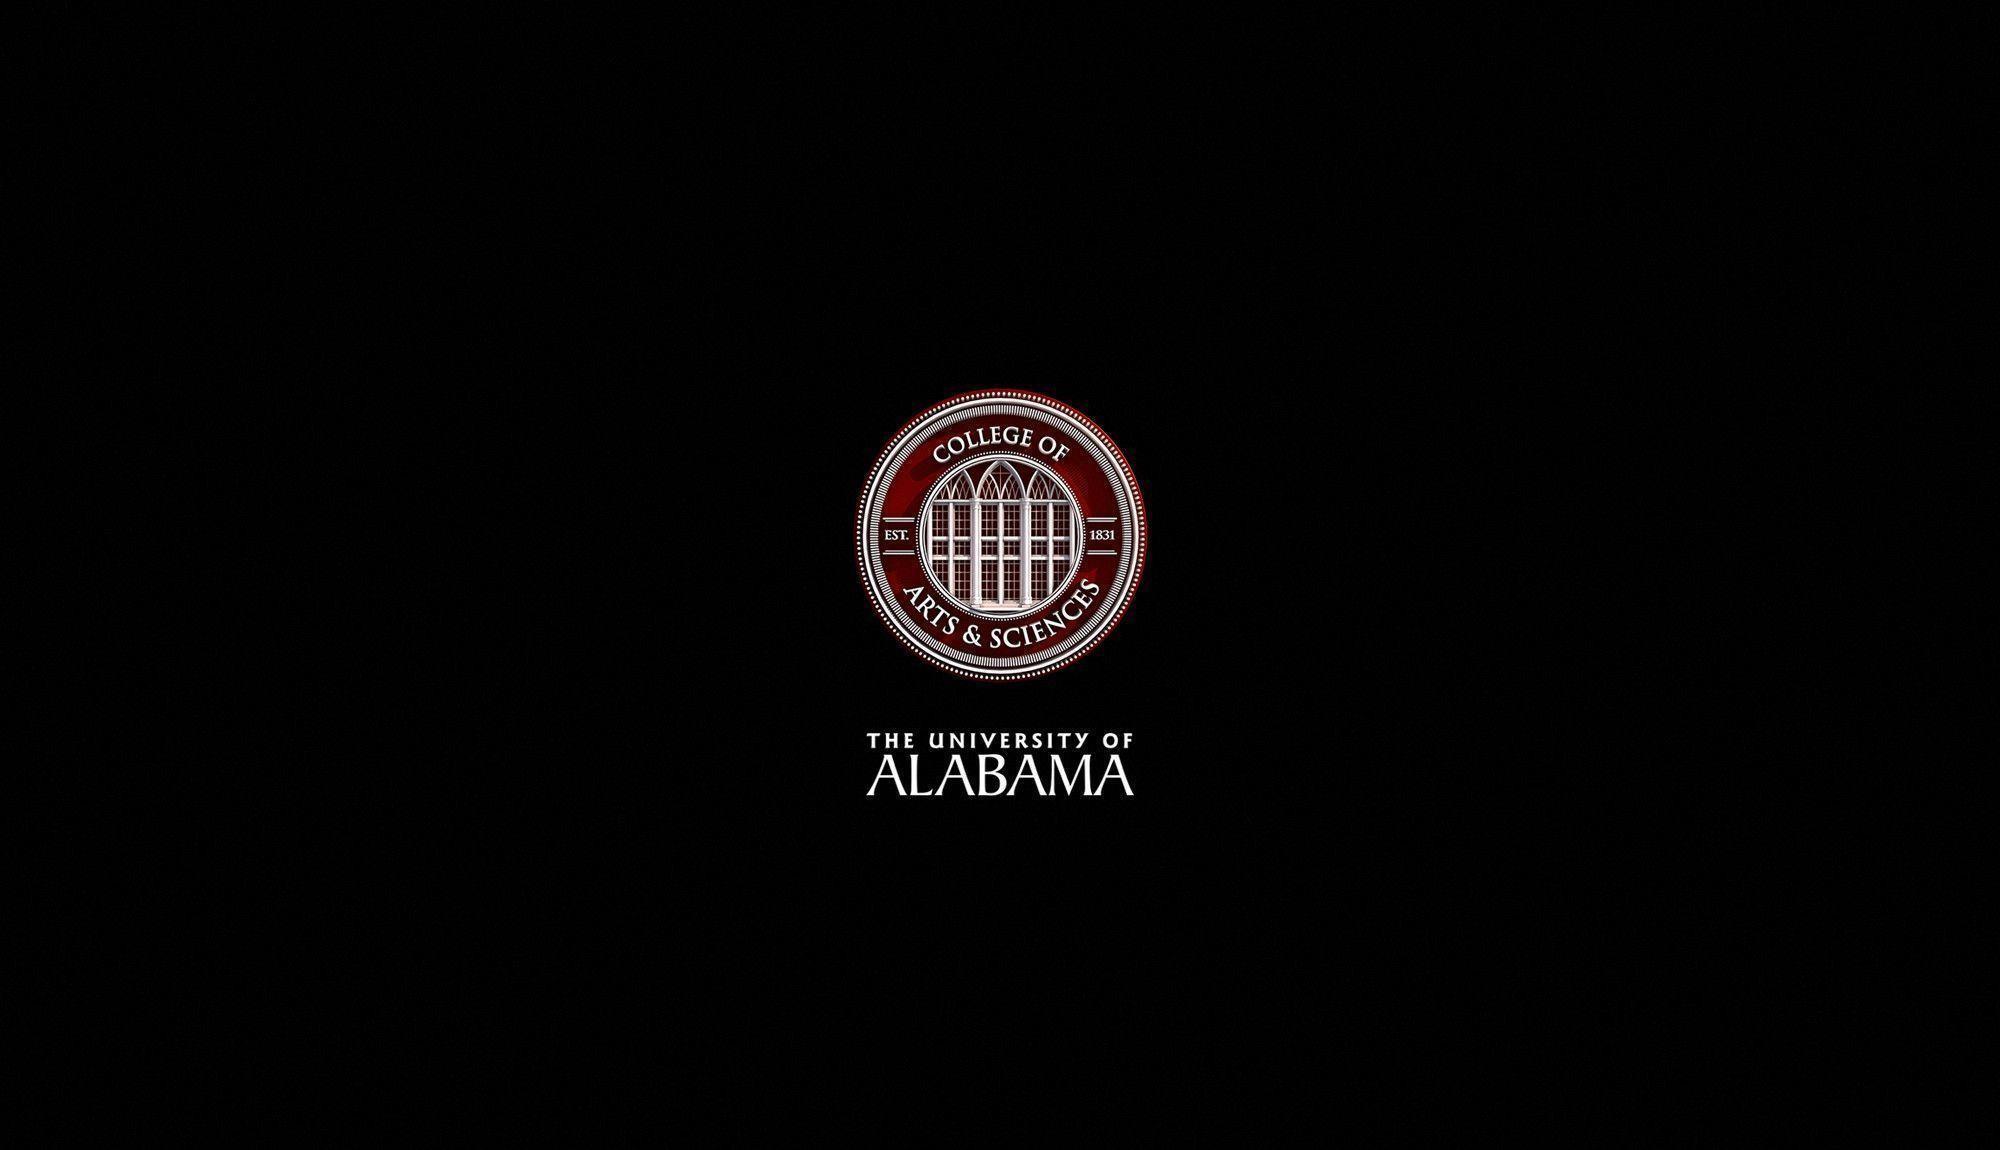 Alabama Crimson Tide Football 350460 1920x1080